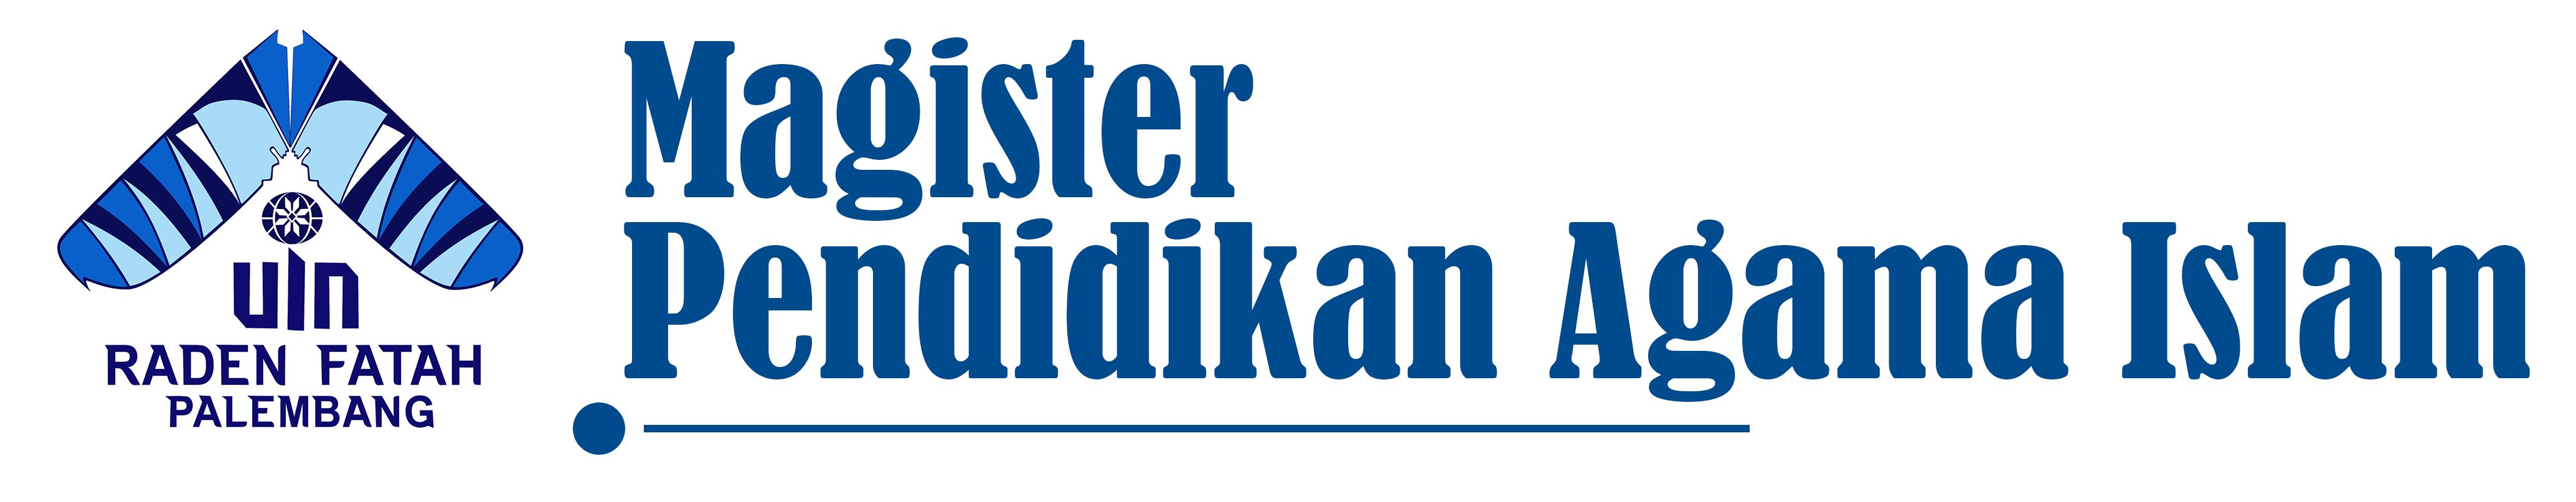 Magister Pendidikan Agama Islam